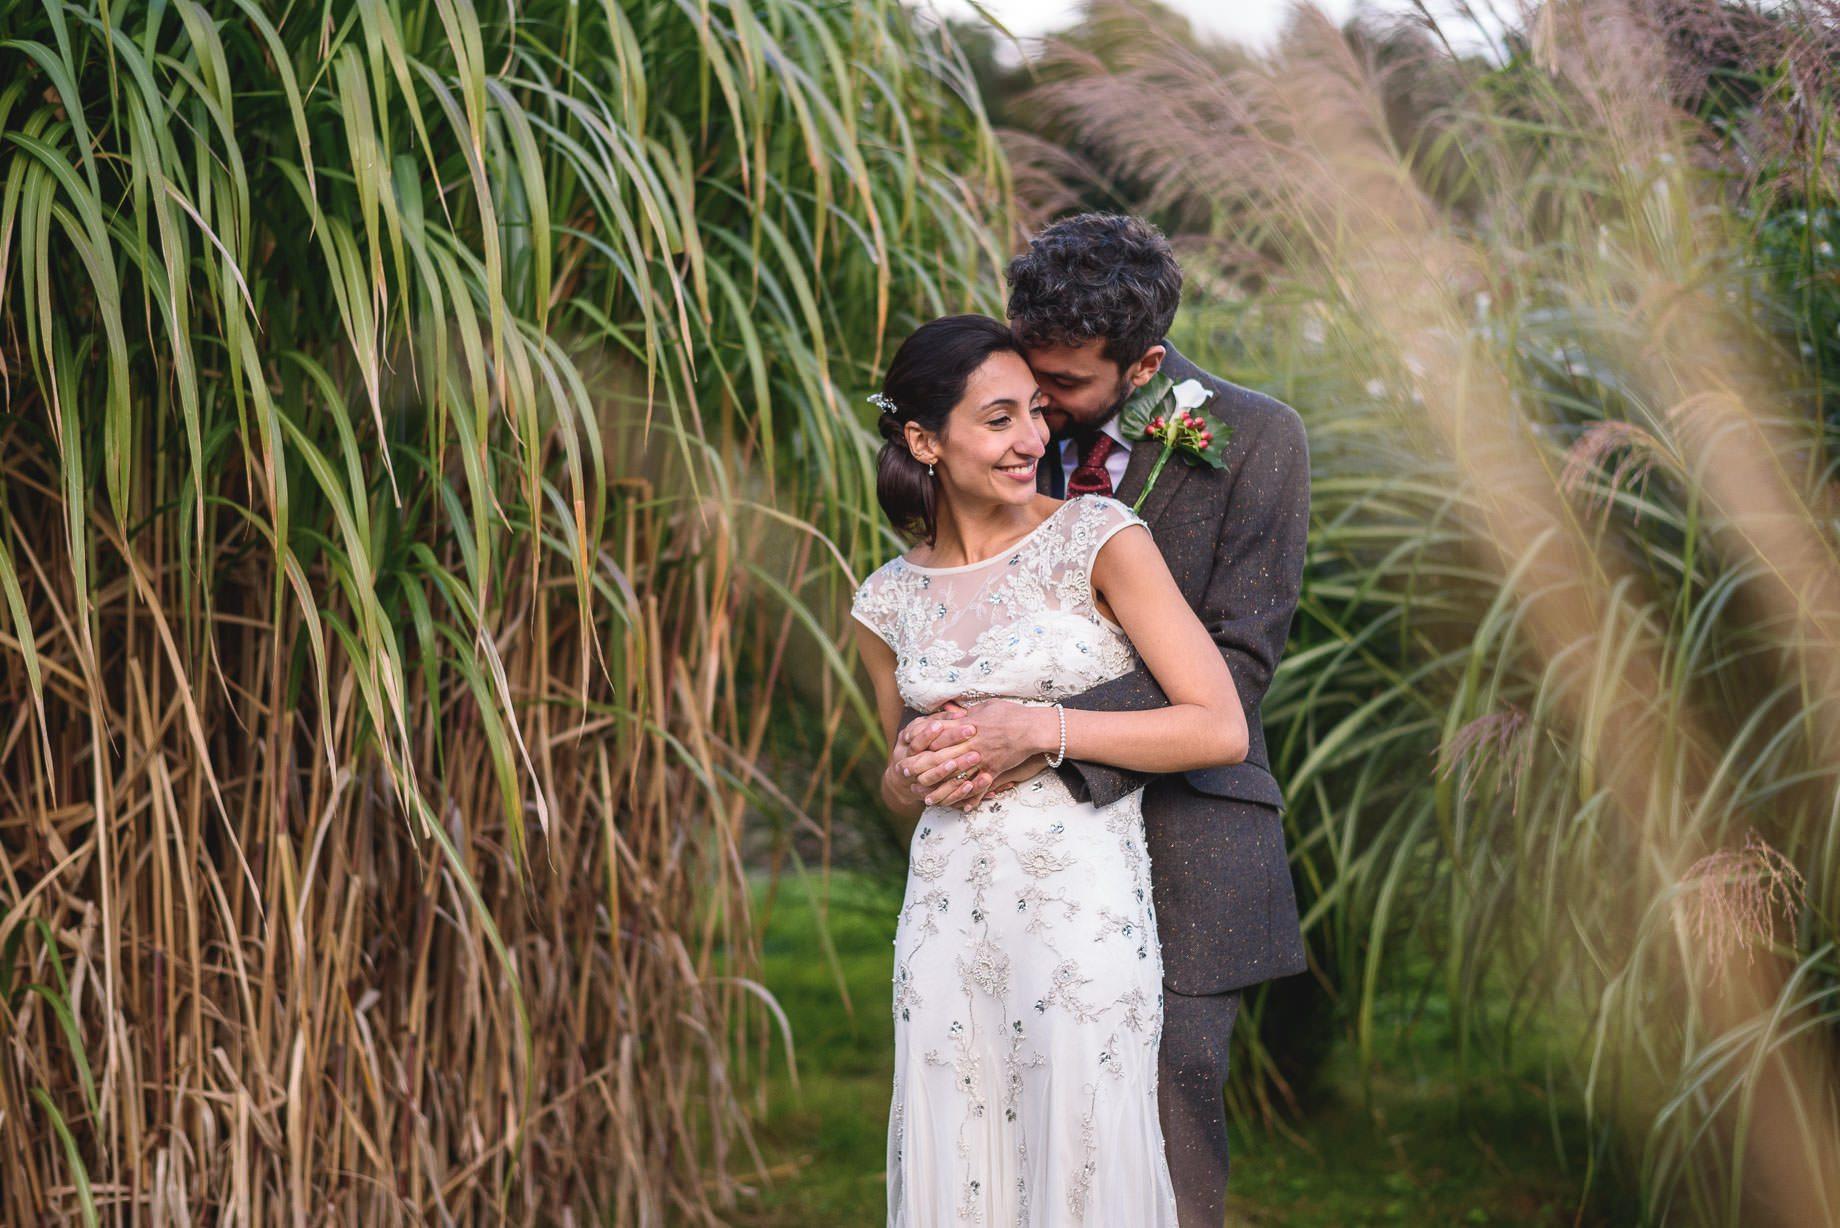 bury-court-barn-wedding-photography-guy-collier-photography-nadia-tom-105-of-184